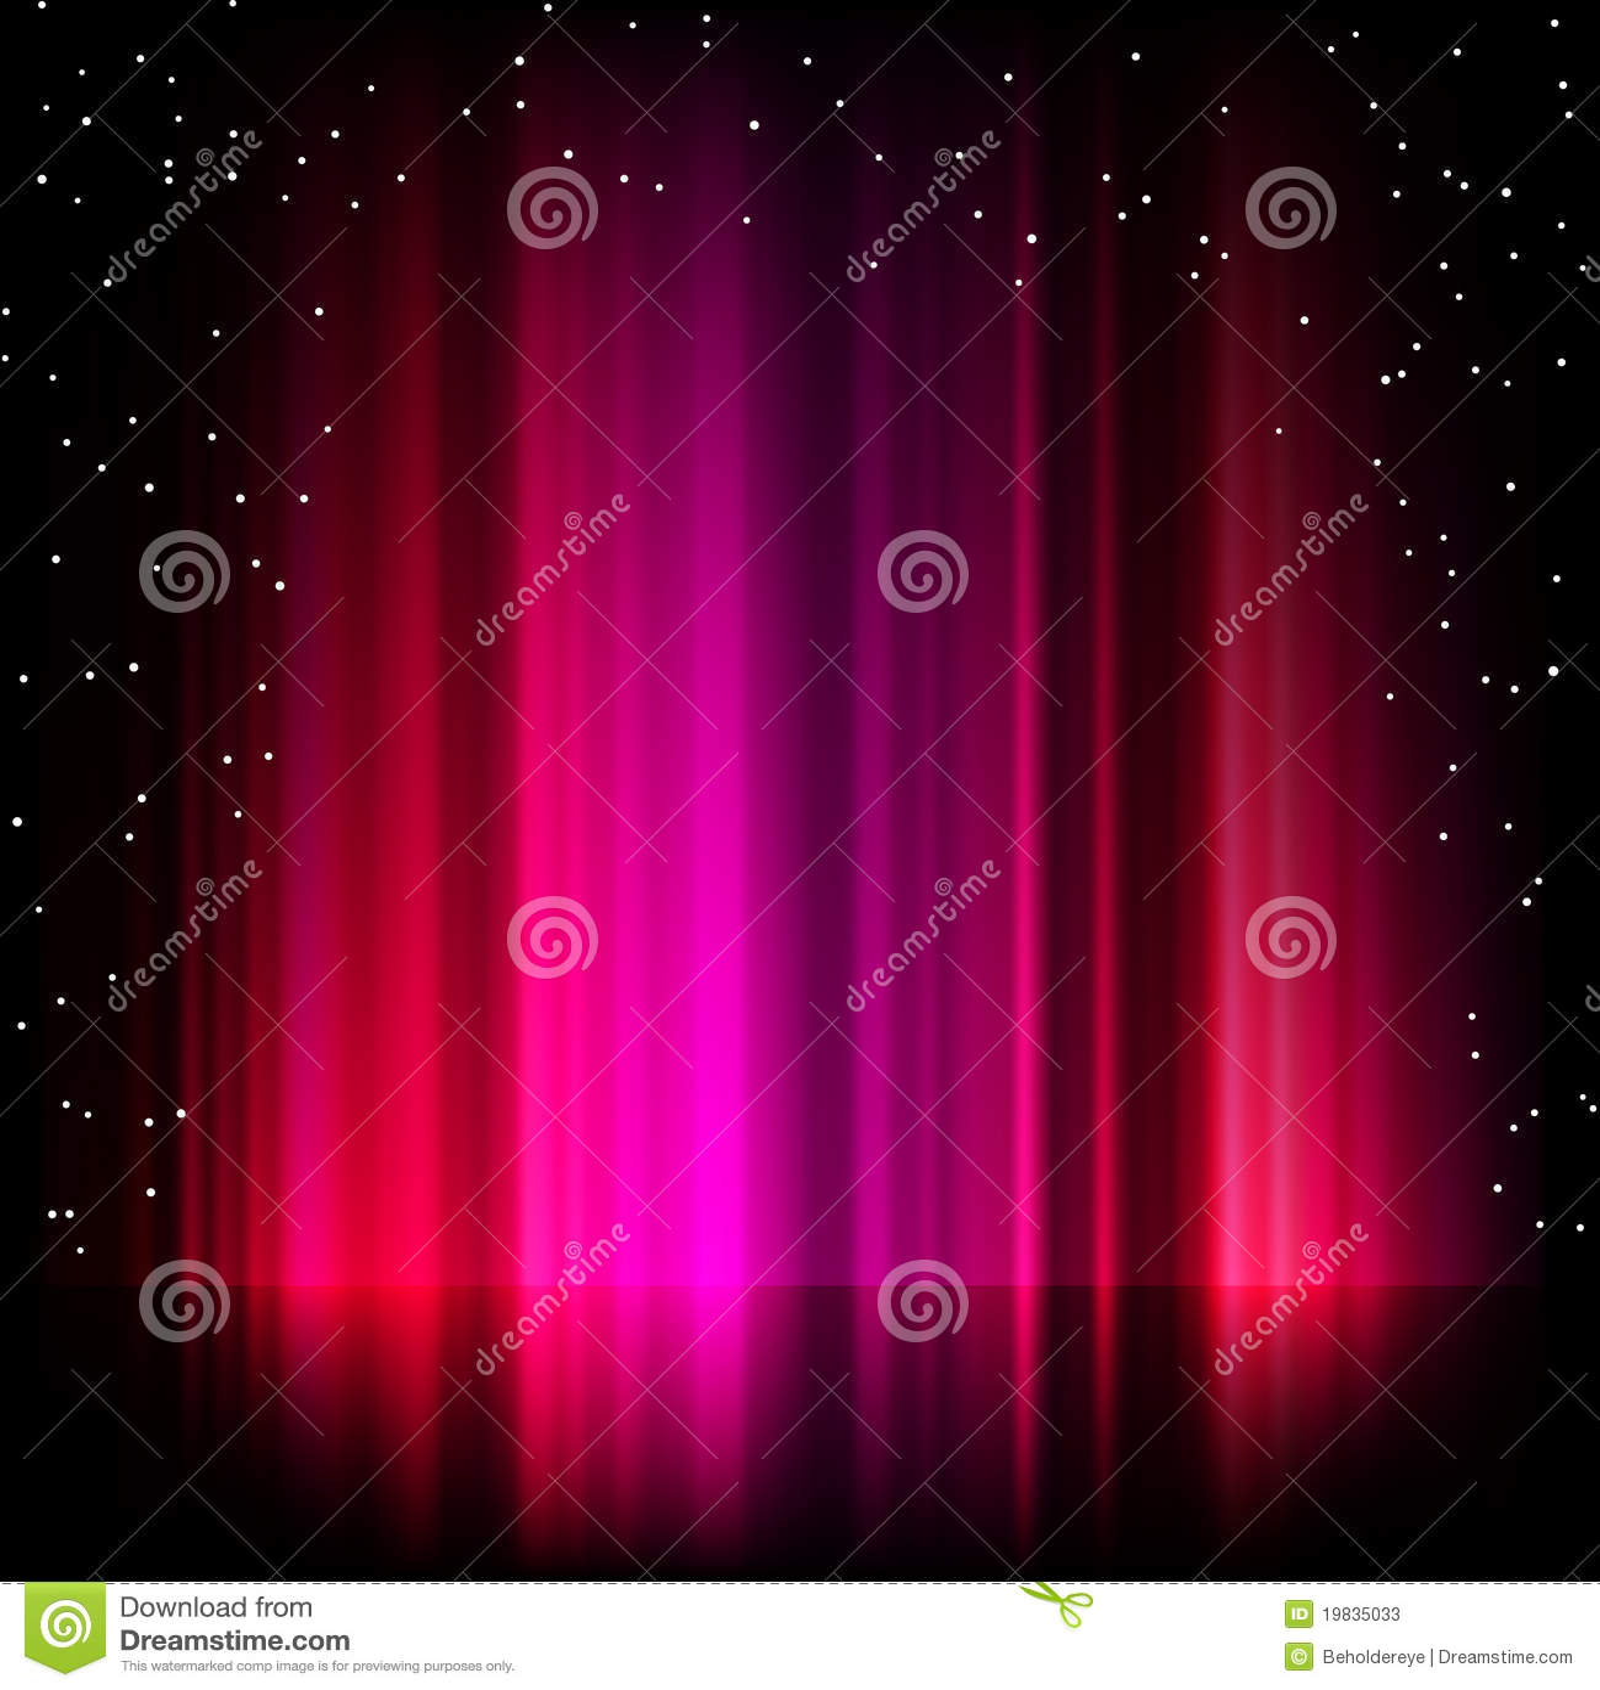 purple aurora borealis wallpapers x - photo #12